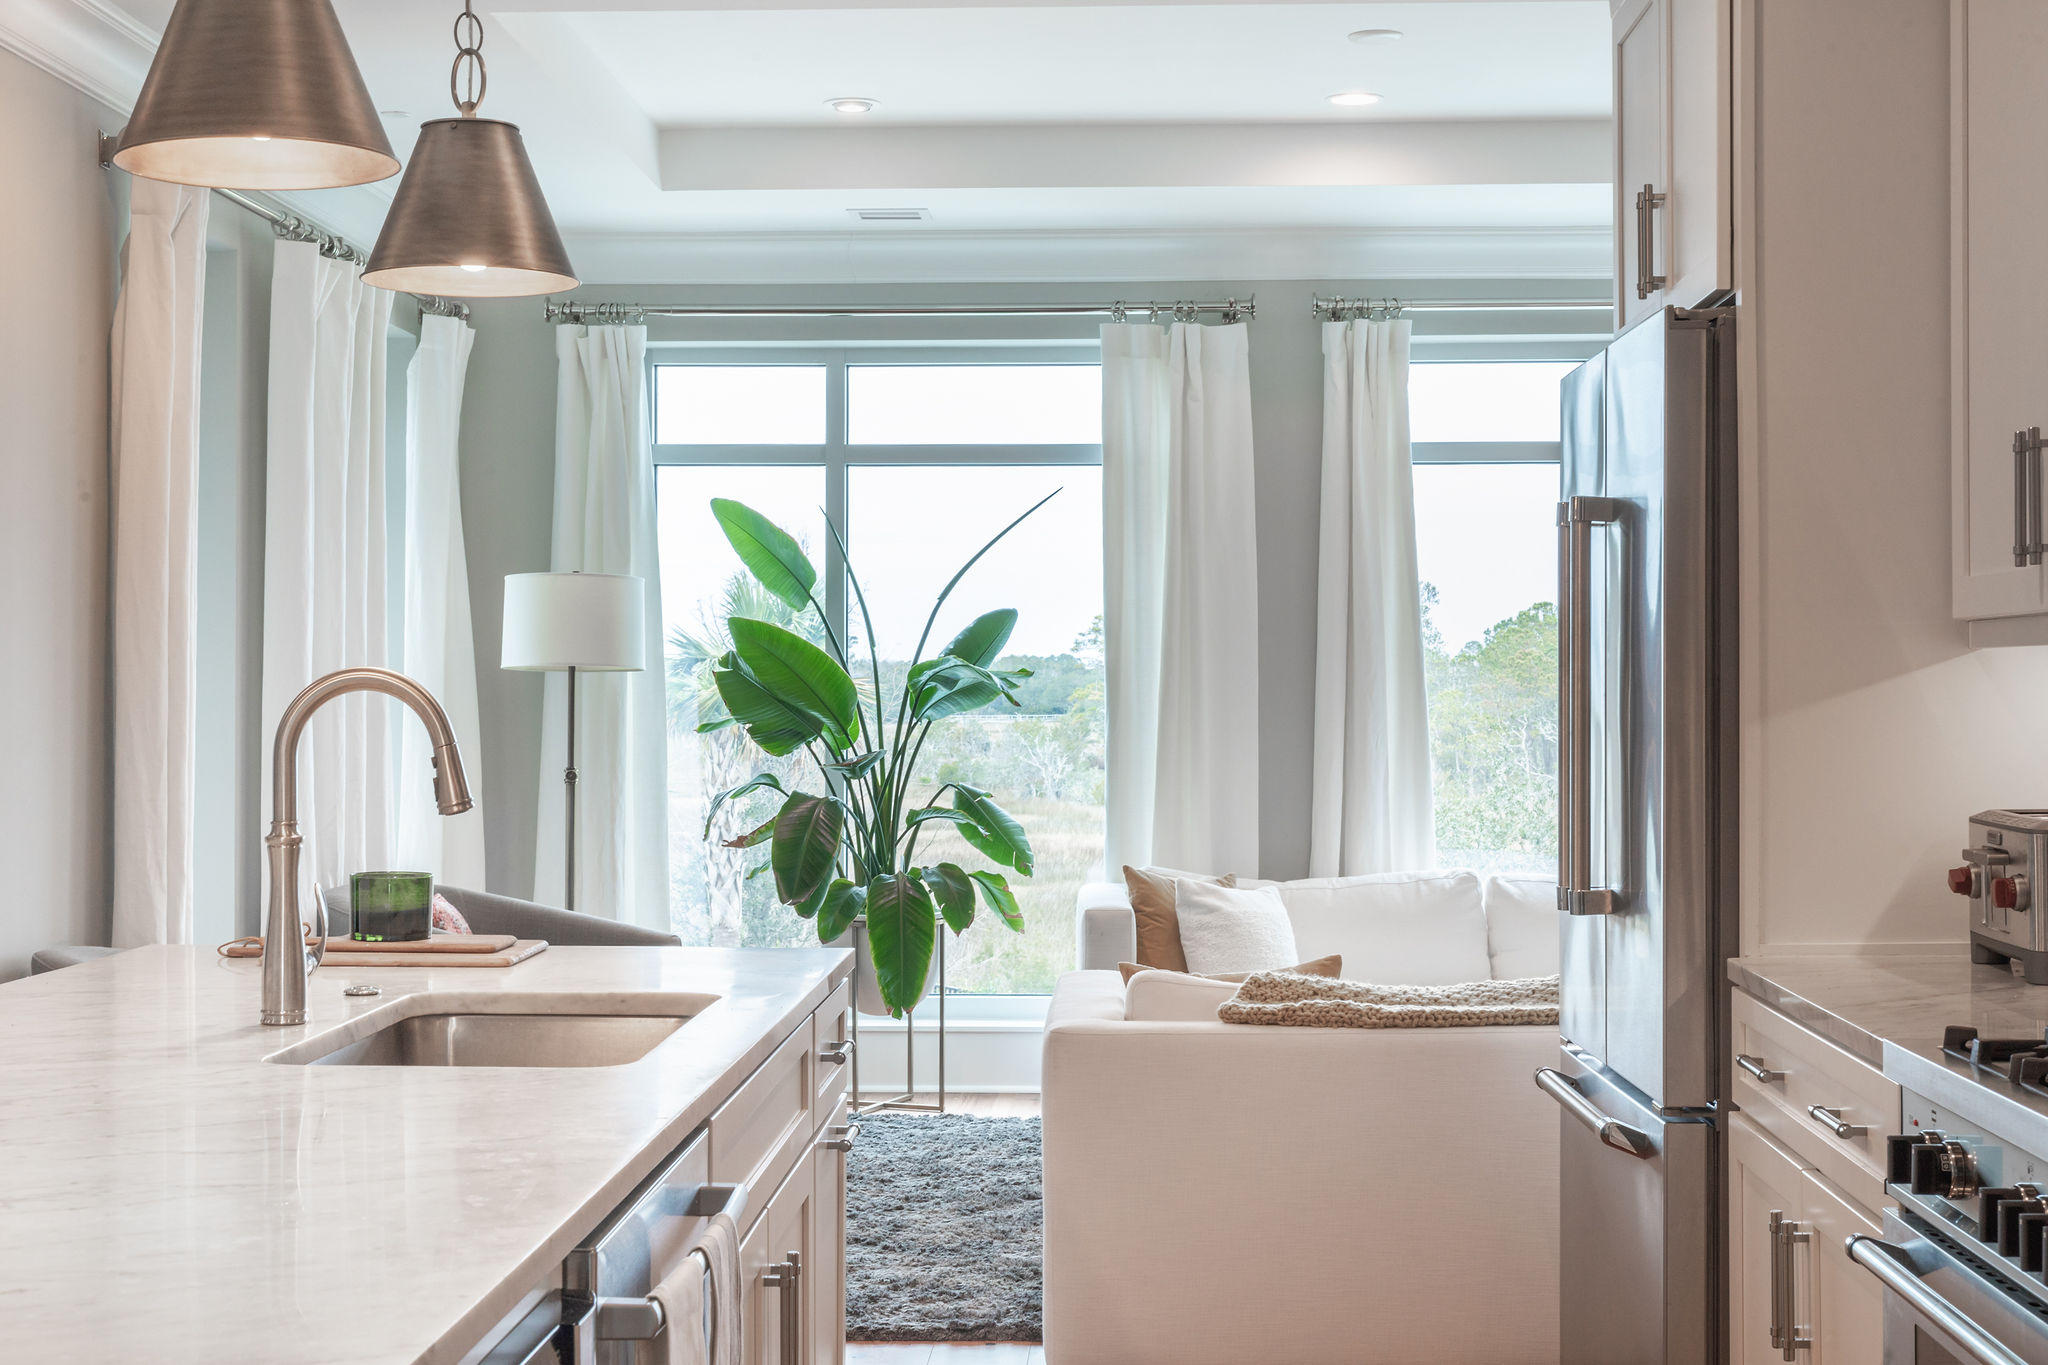 Tides IV Condominiums Homes For Sale - 155 Wingo, Mount Pleasant, SC - 30